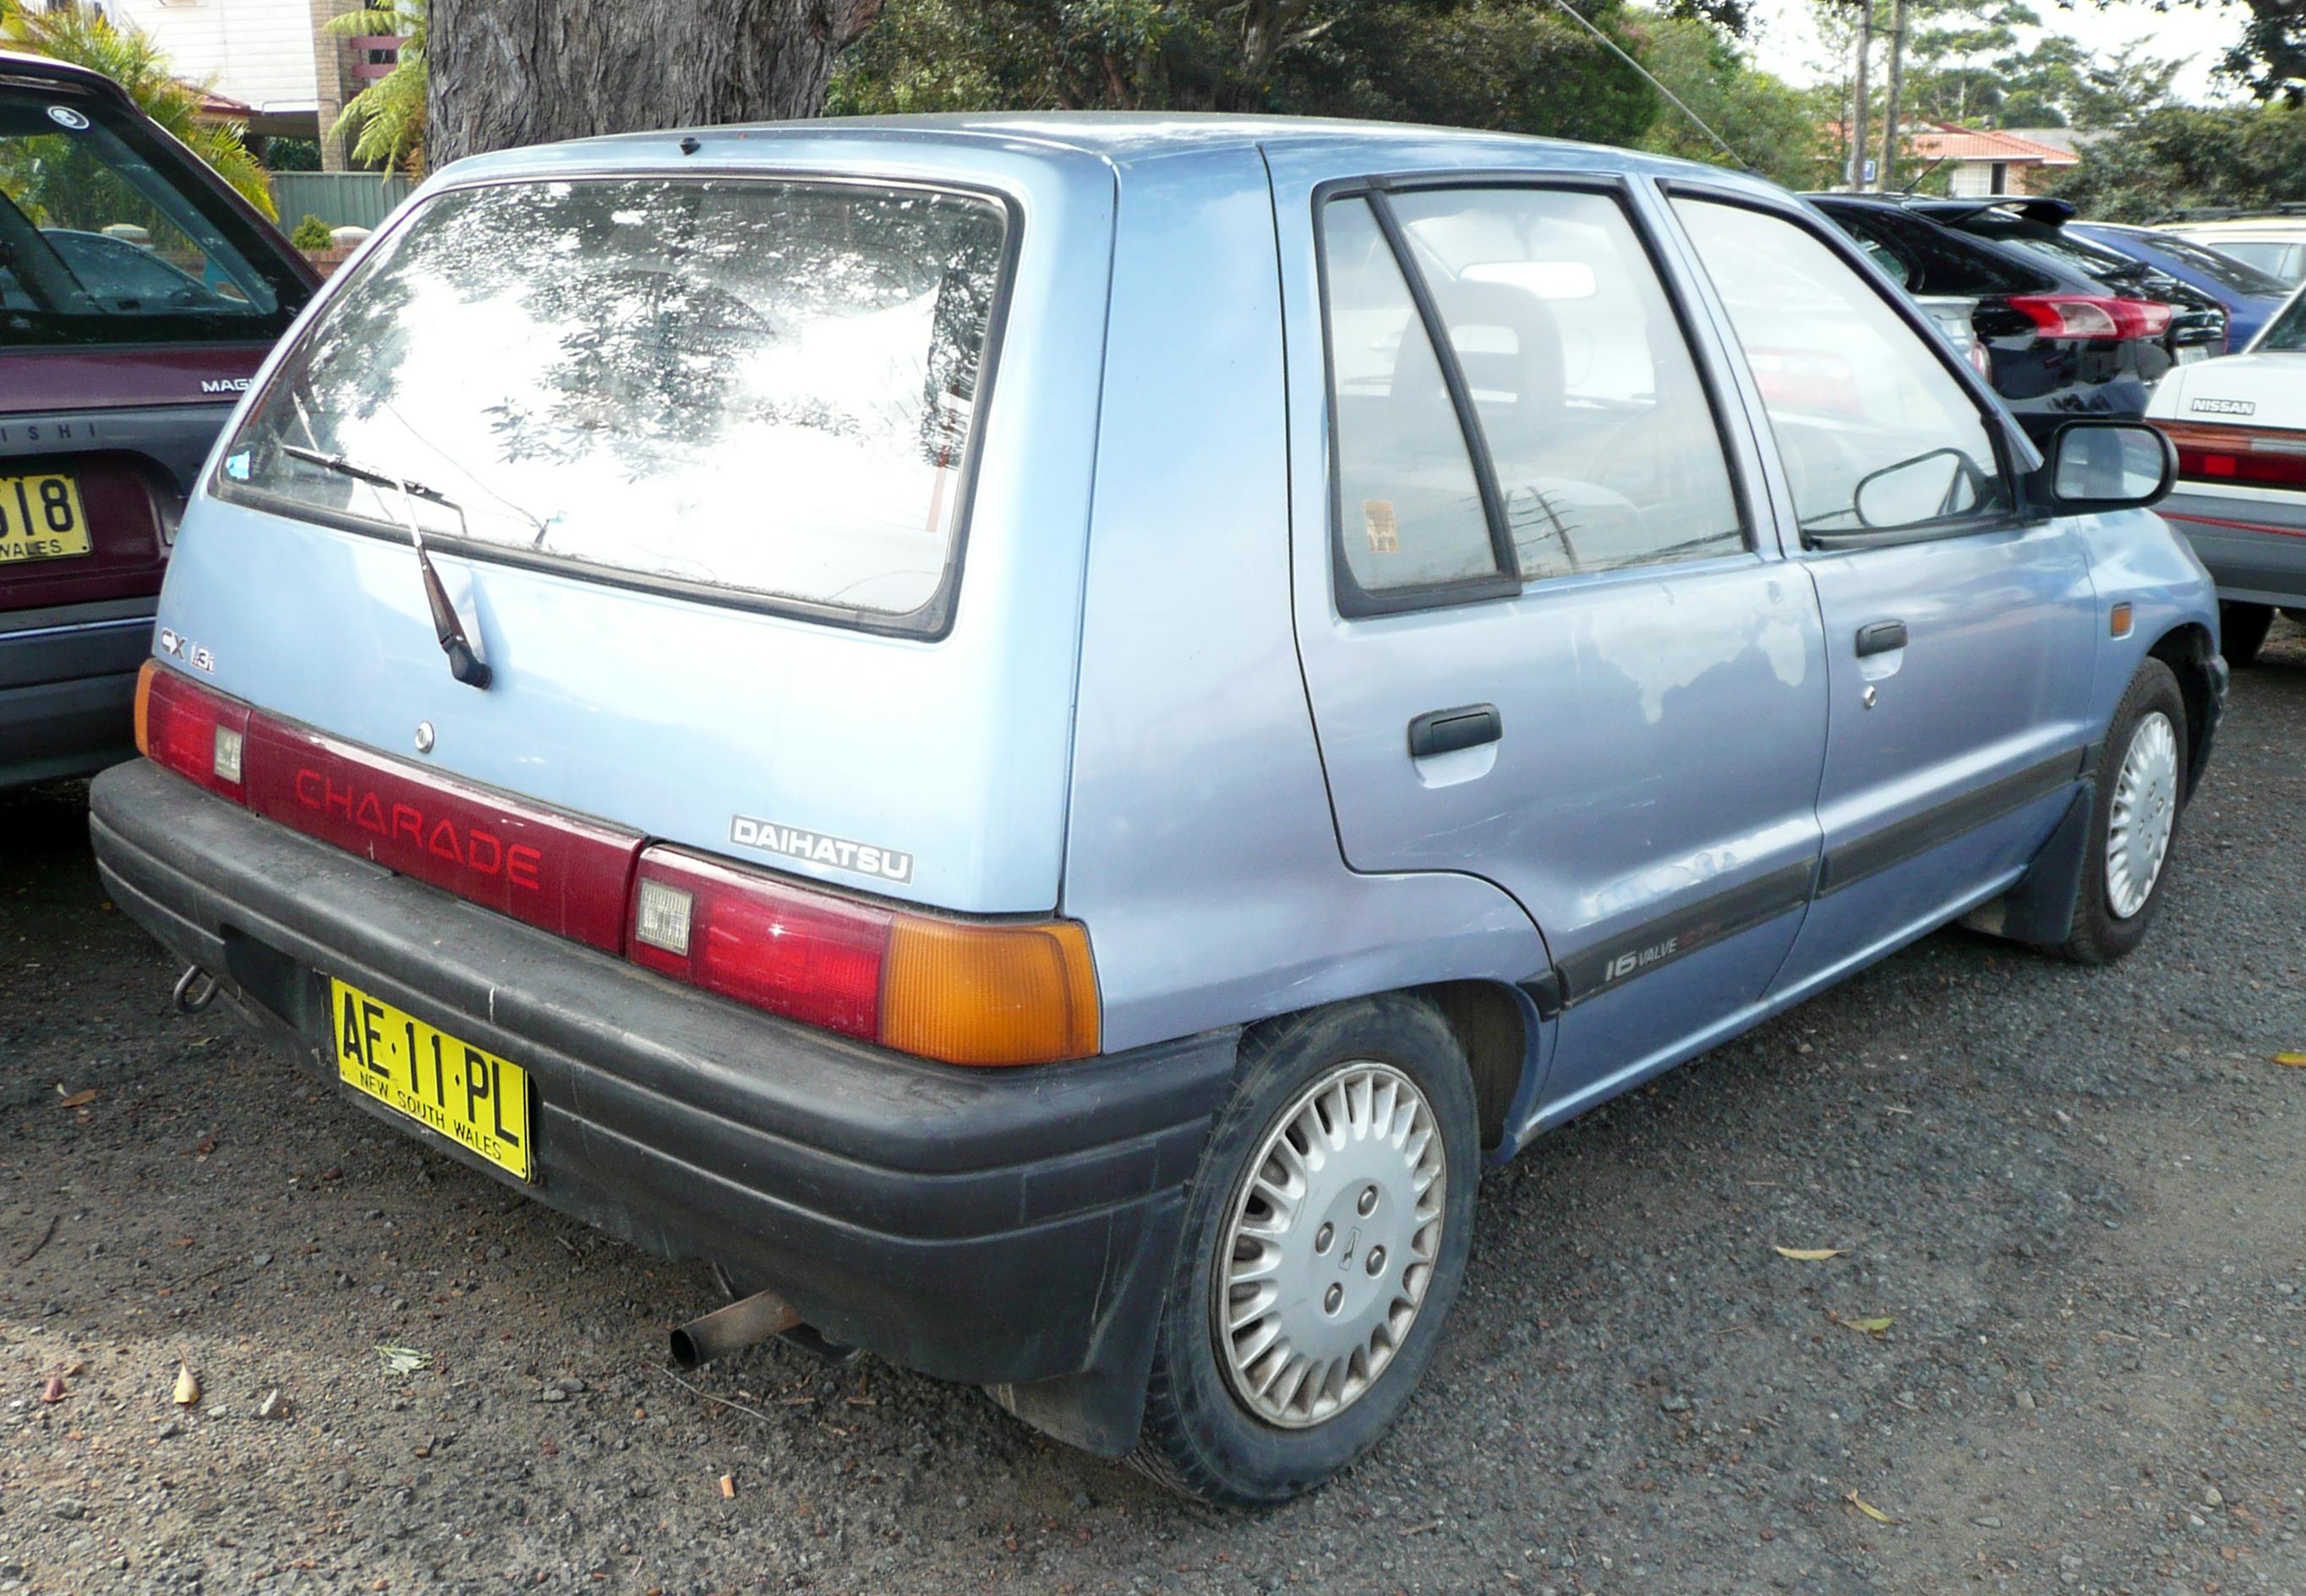 Daihatsu Charade IV Restyling 1996 - 2000 Hatchback 5 door #3